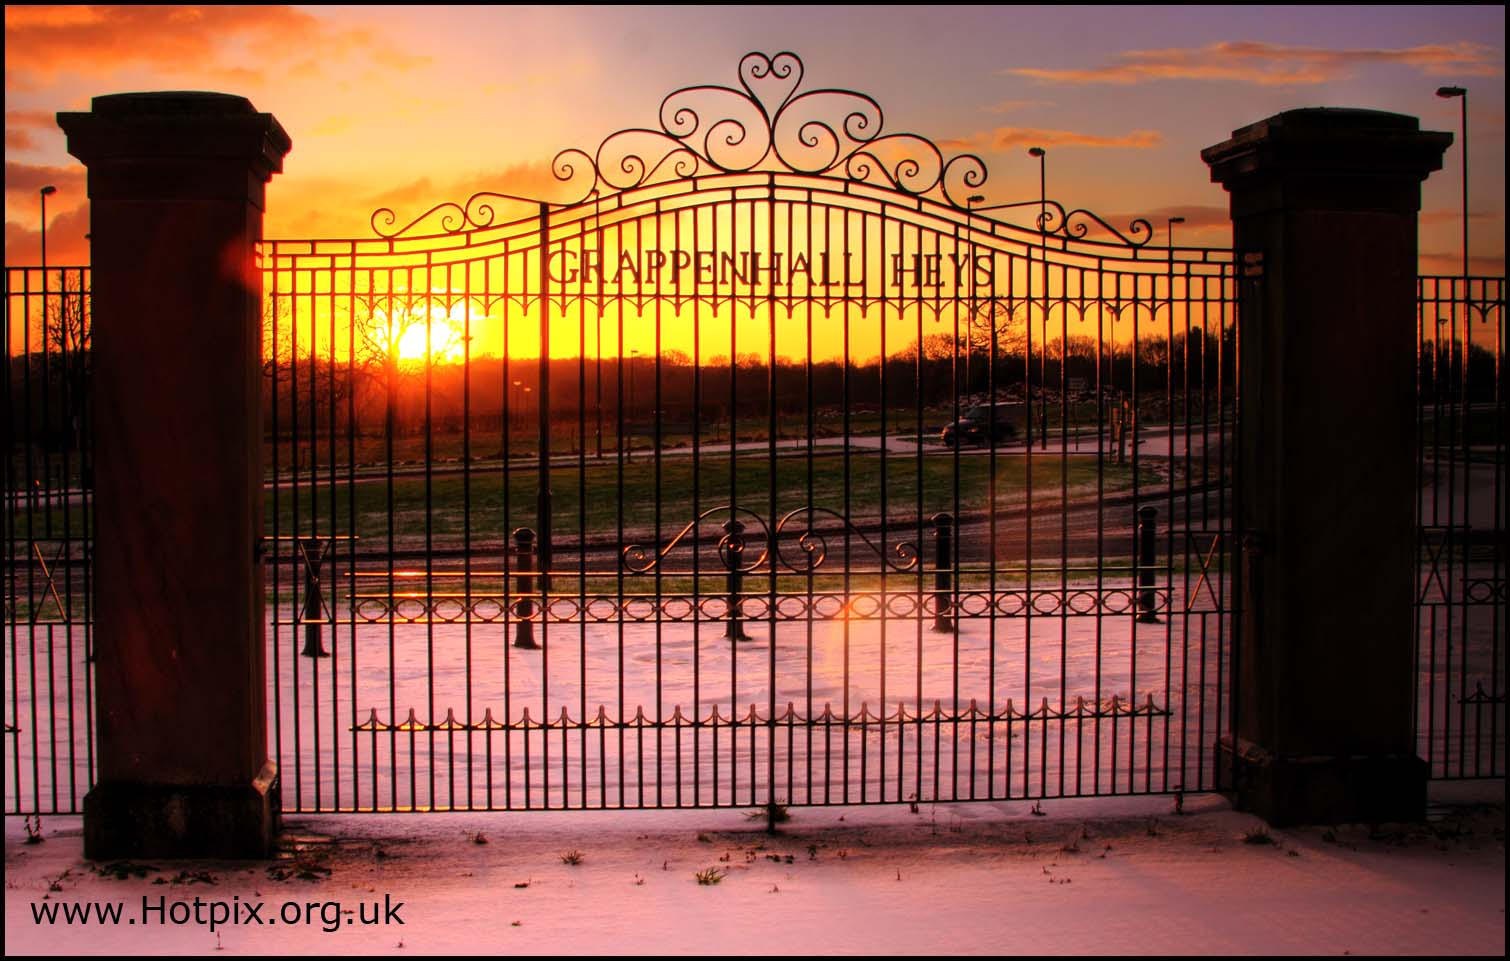 Grappenhall Heys,Grappenhall,Heys,sunset,winter,snow,snowy,scene,christmas,xmas,gate,gates,purple,gold,sun,set,rise,village,cheshire,england,britain,north,west,warrington,house,housing,estate,development,scheme,community,residential,astor,drive,stansfield,lichfield,lumbbrook,road,new,lane,tony,smith,tonysmith,hotpix,hotpixuk,tdk,tdktony,\u96ea,sneeuw,neige,Schnee,\u0441\u043d\u0435\u0436\u043e\u043a,nieve,HDR,high dynamic range,Hotpicks,hotpics,hot,pics,pix,picks,highway,hotpix.freeserve.co.uk